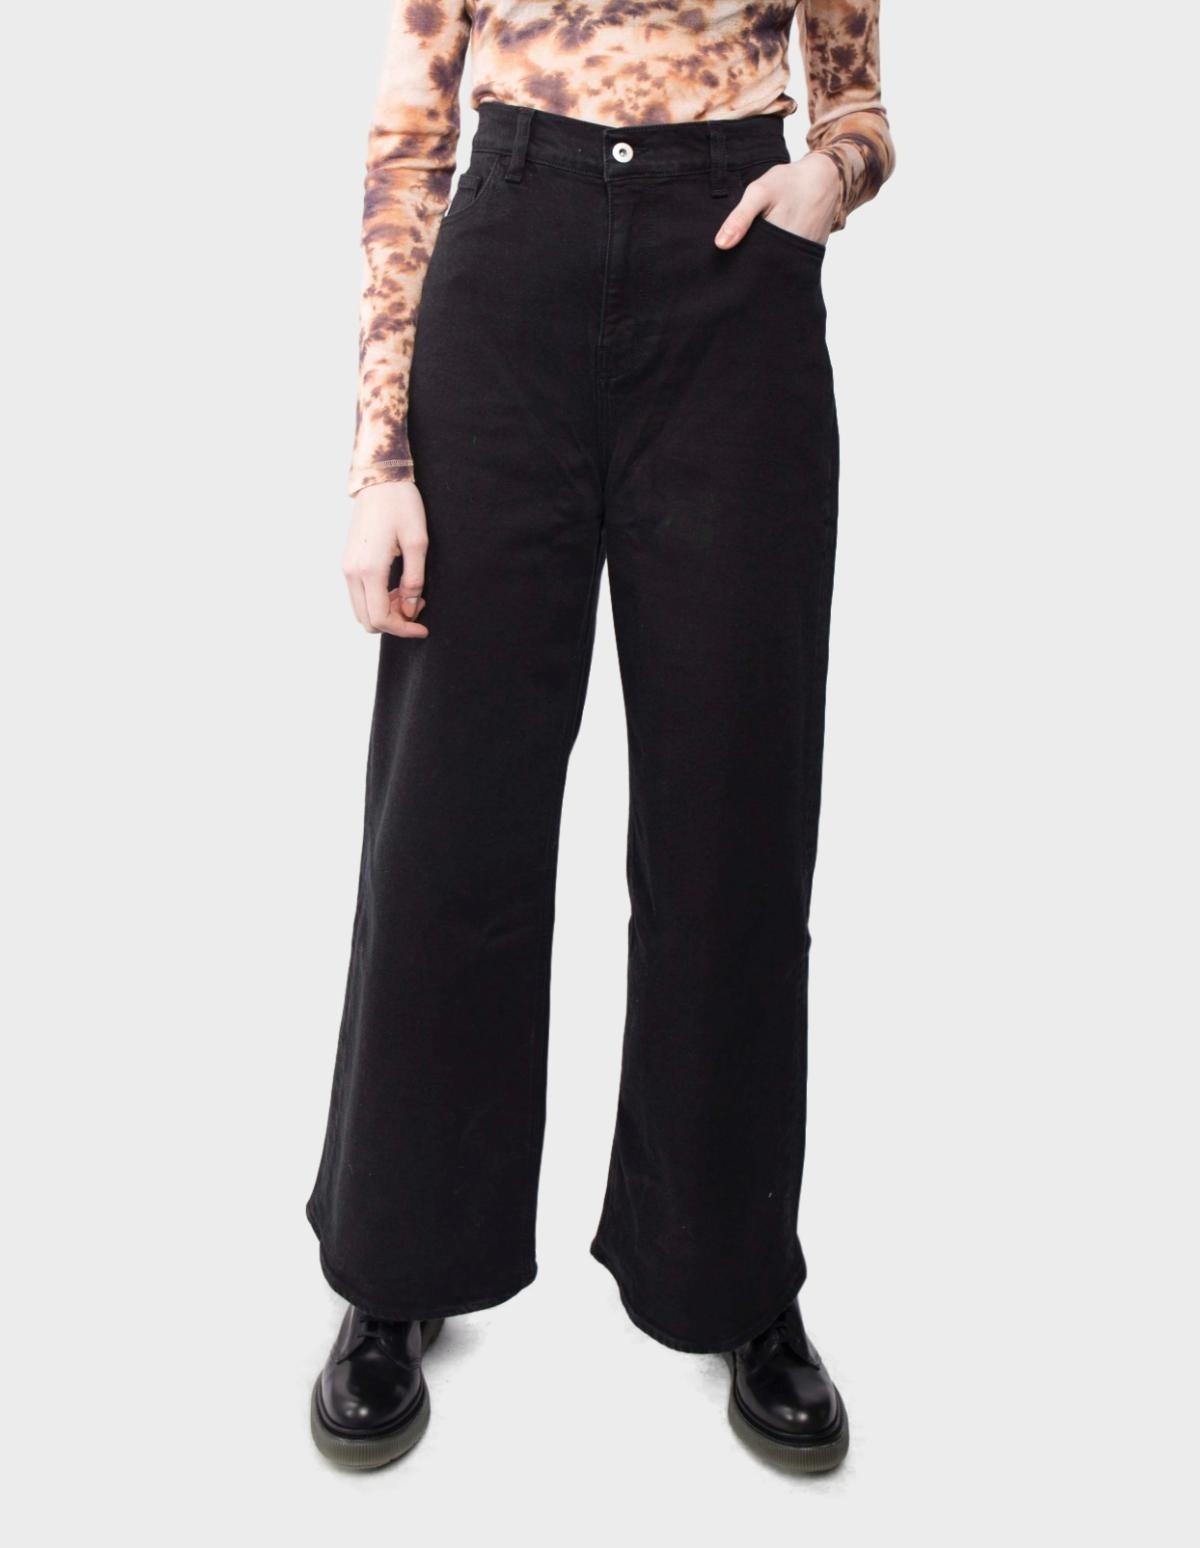 YMC You Must Create Debbie Jeans in Black